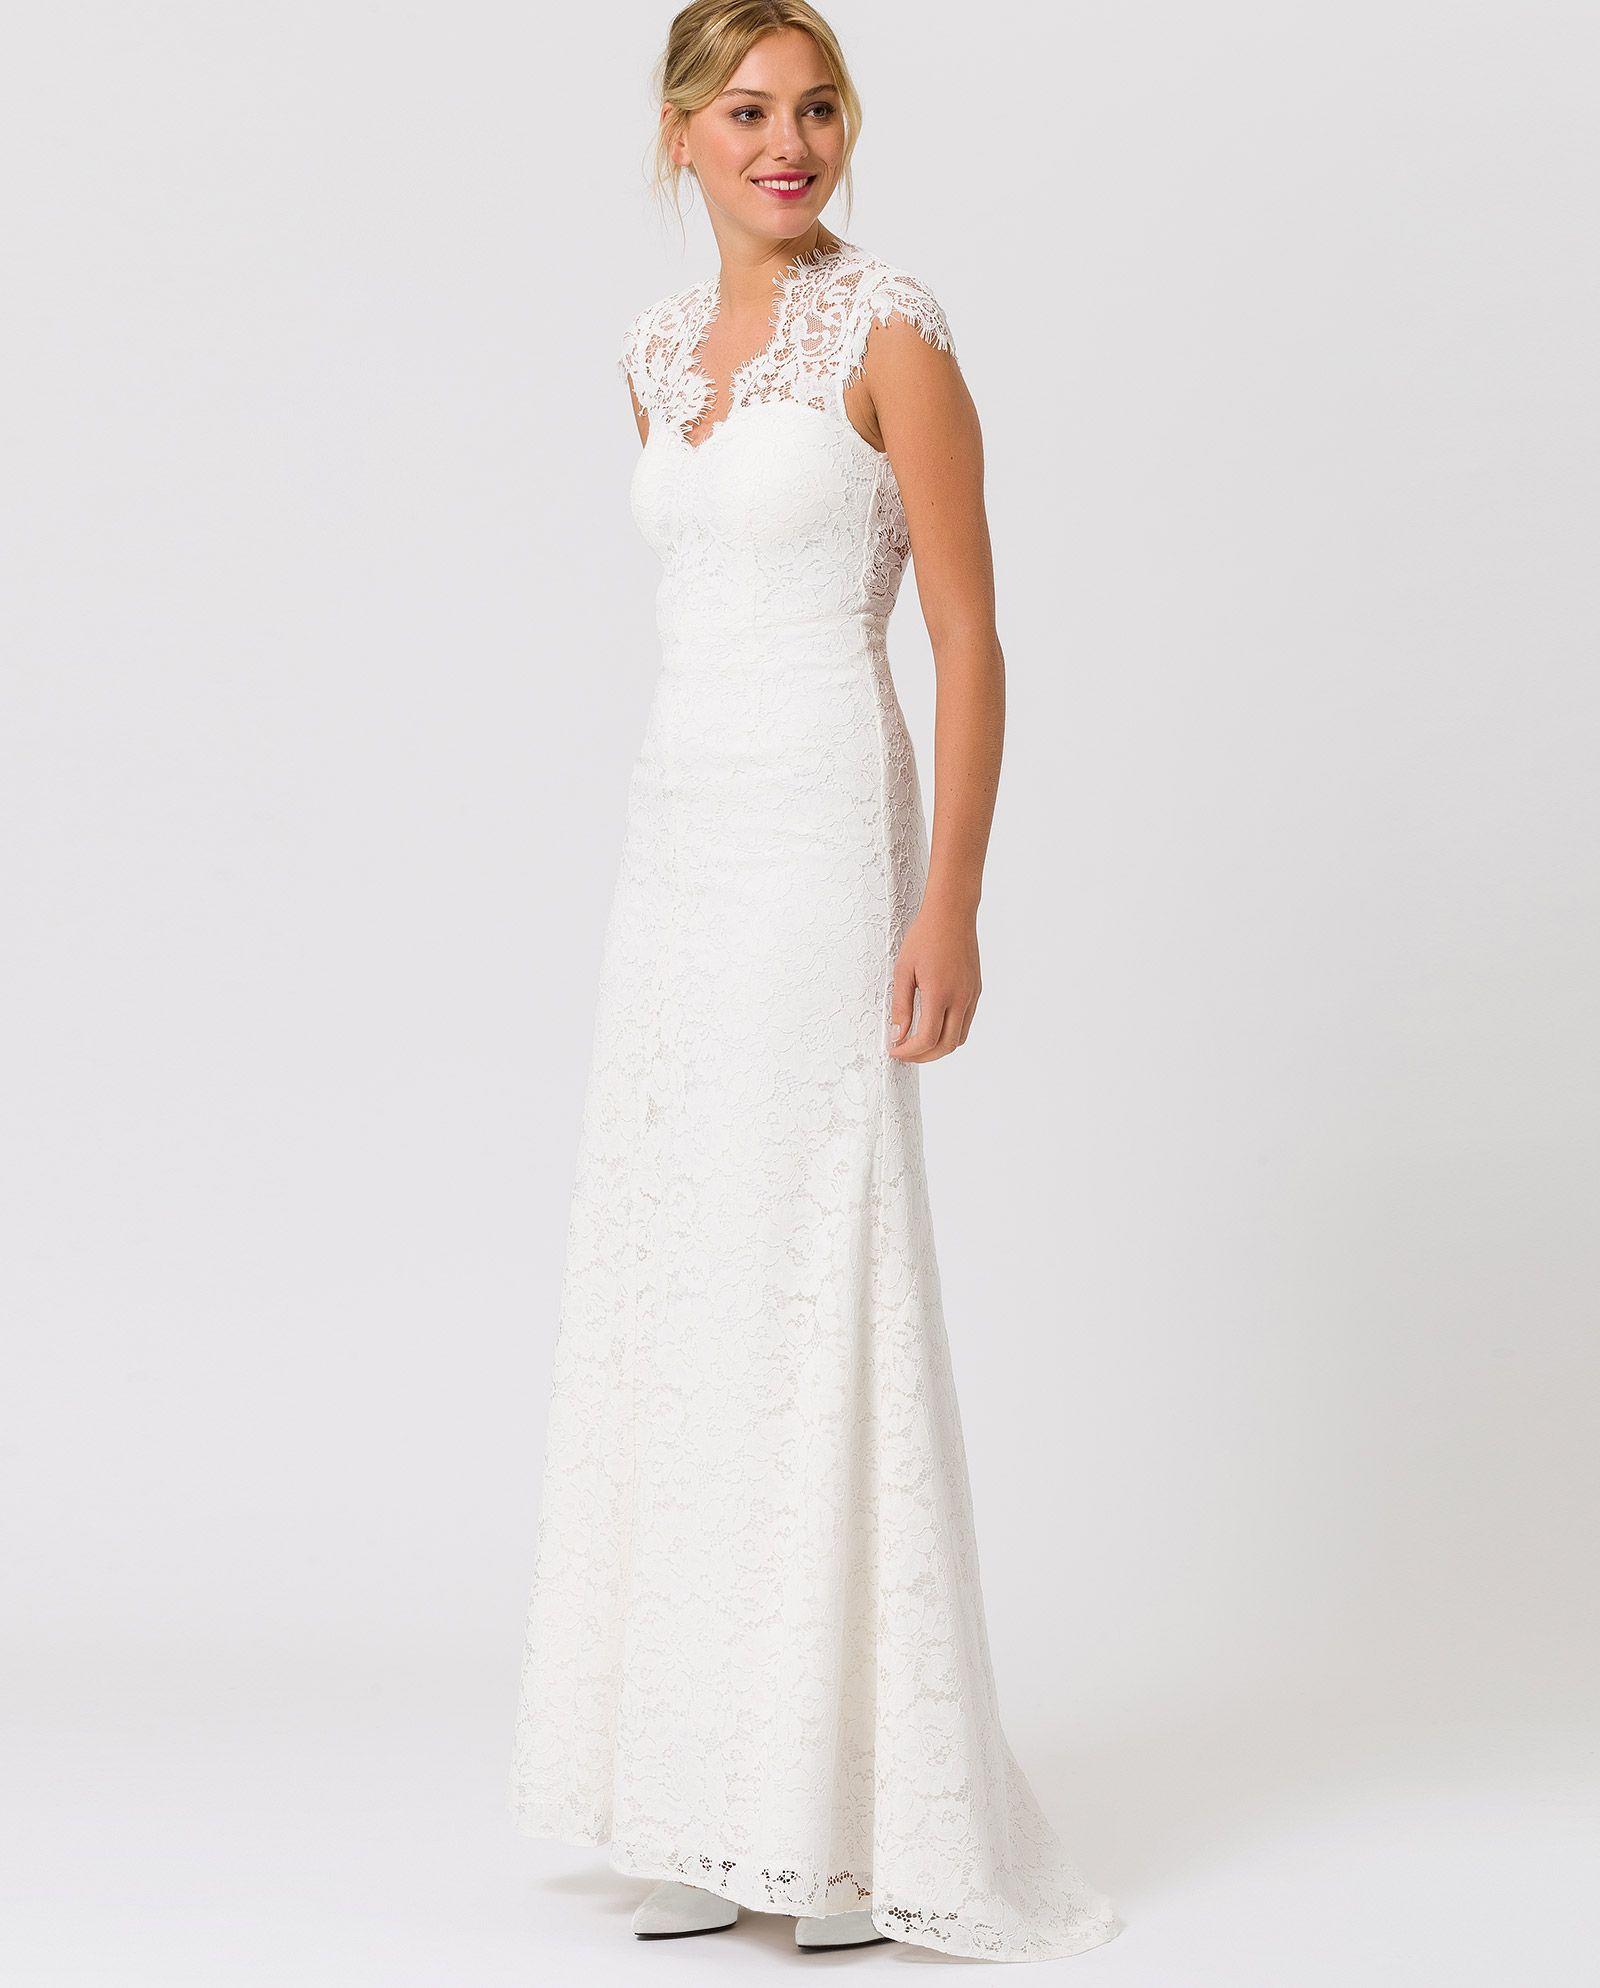 Bridal Lace Dress | Pinterest | Bridal lace and Wedding